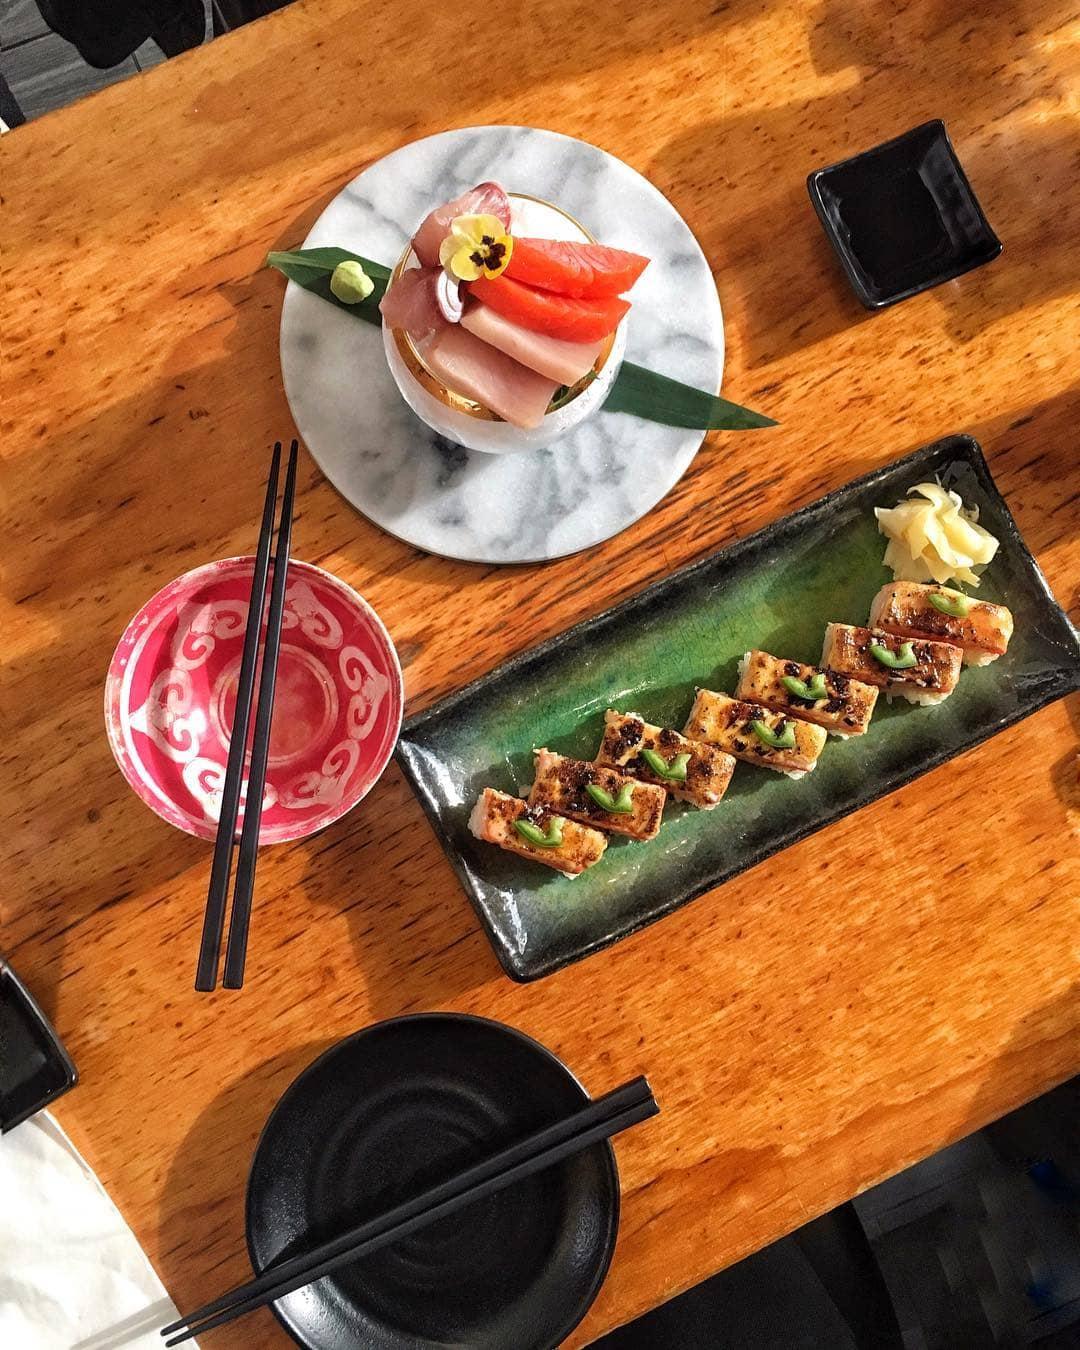 Oshi aburi sushi and plates and sashimi